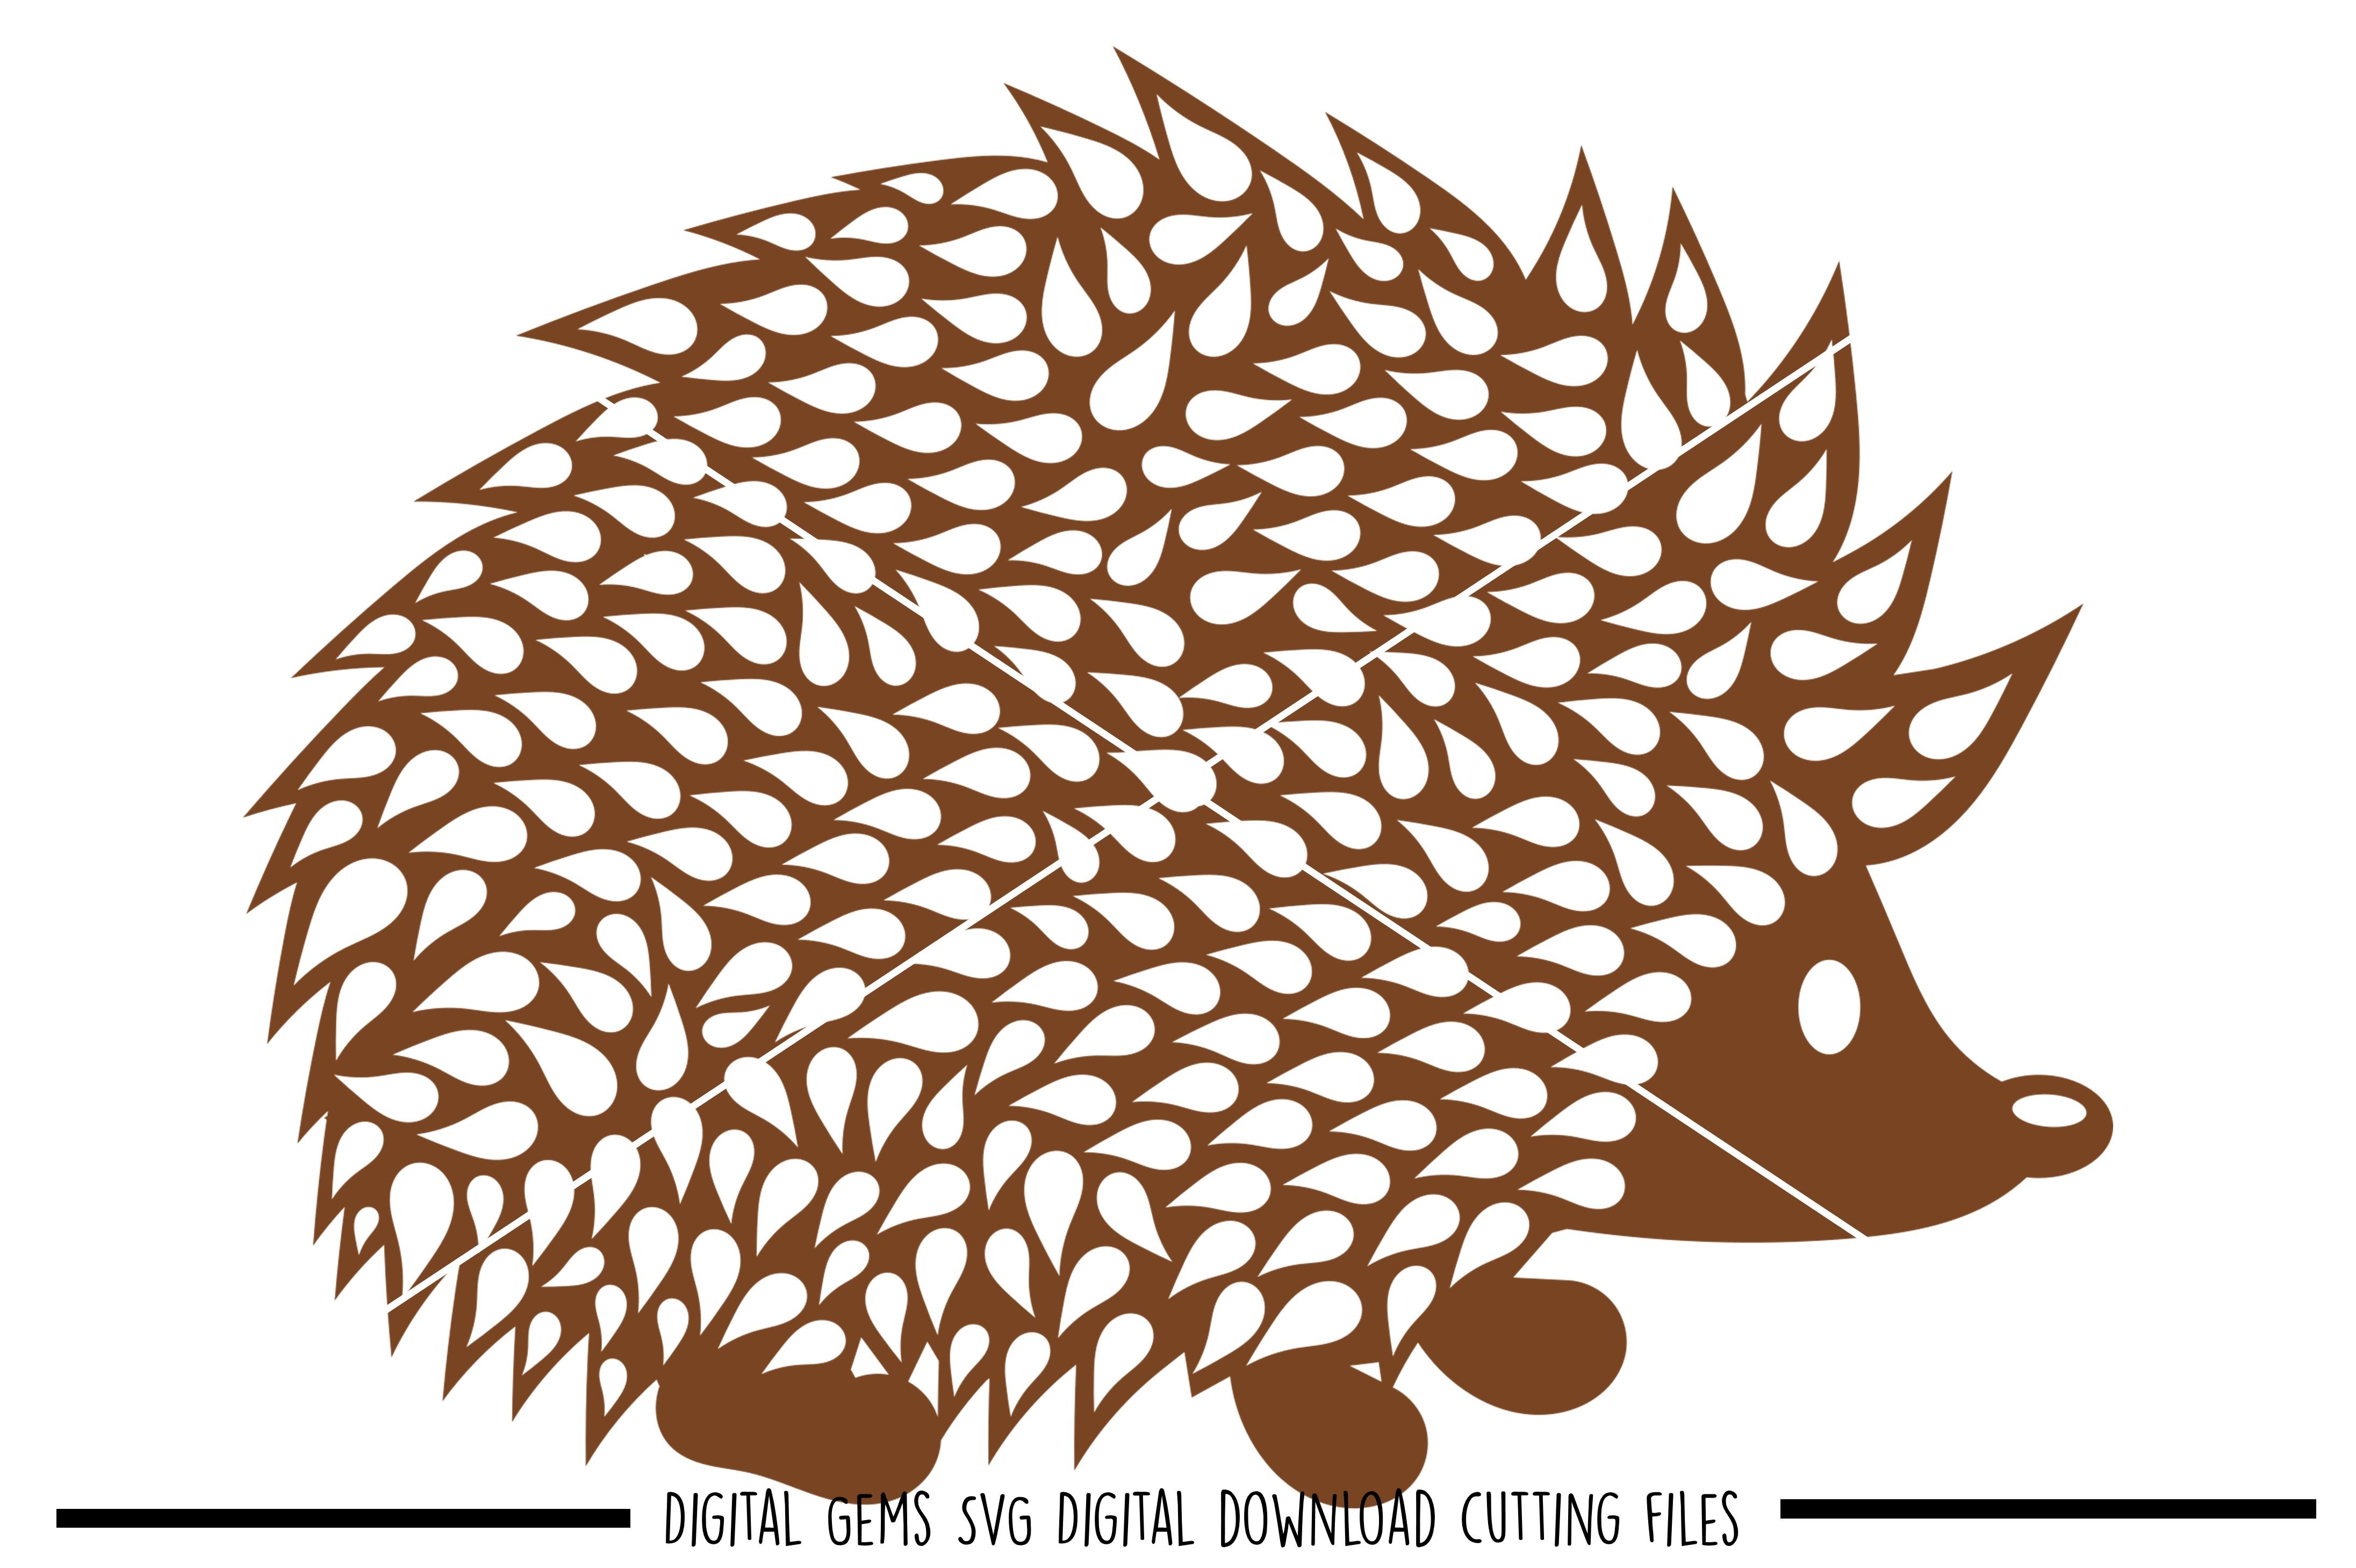 Hedgehog SVG / DXF / EPS / PNG files example image 1